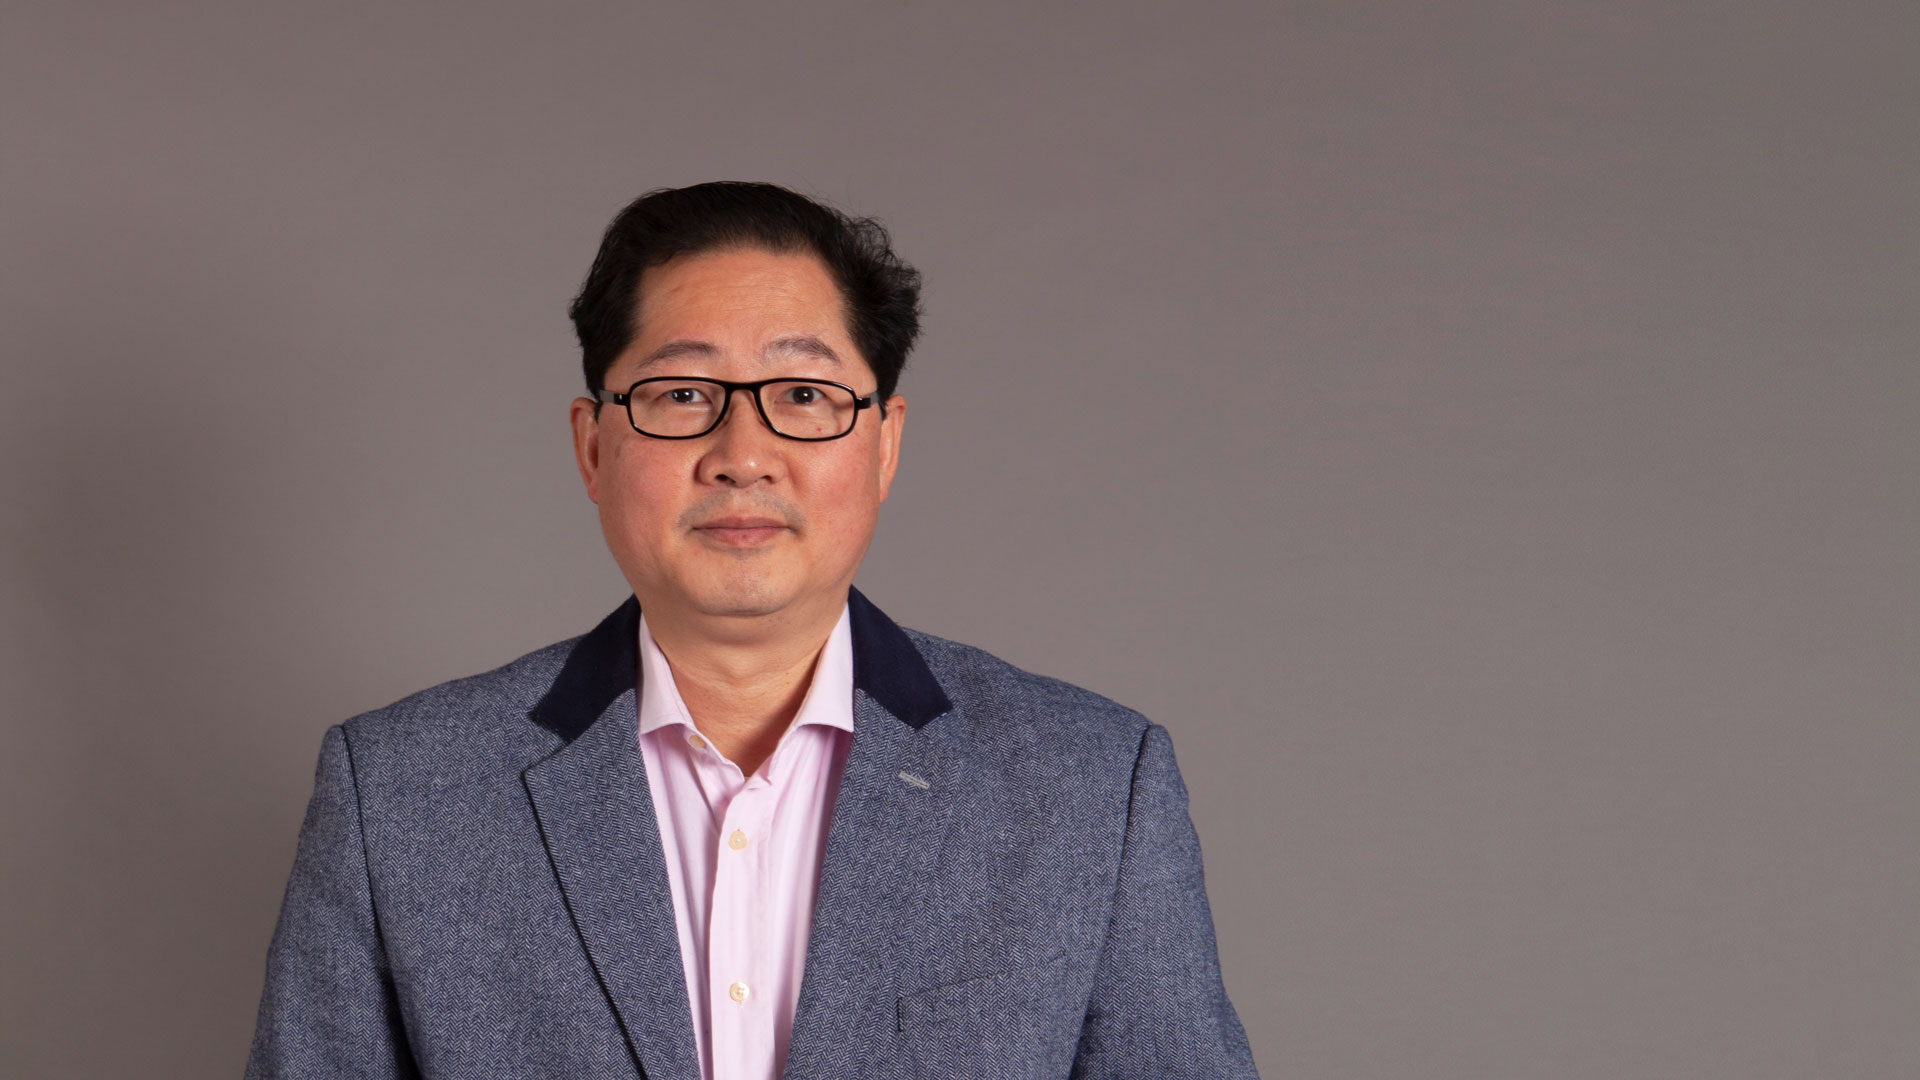 Dr. Coen Gho docteur Institut de la science capillaire